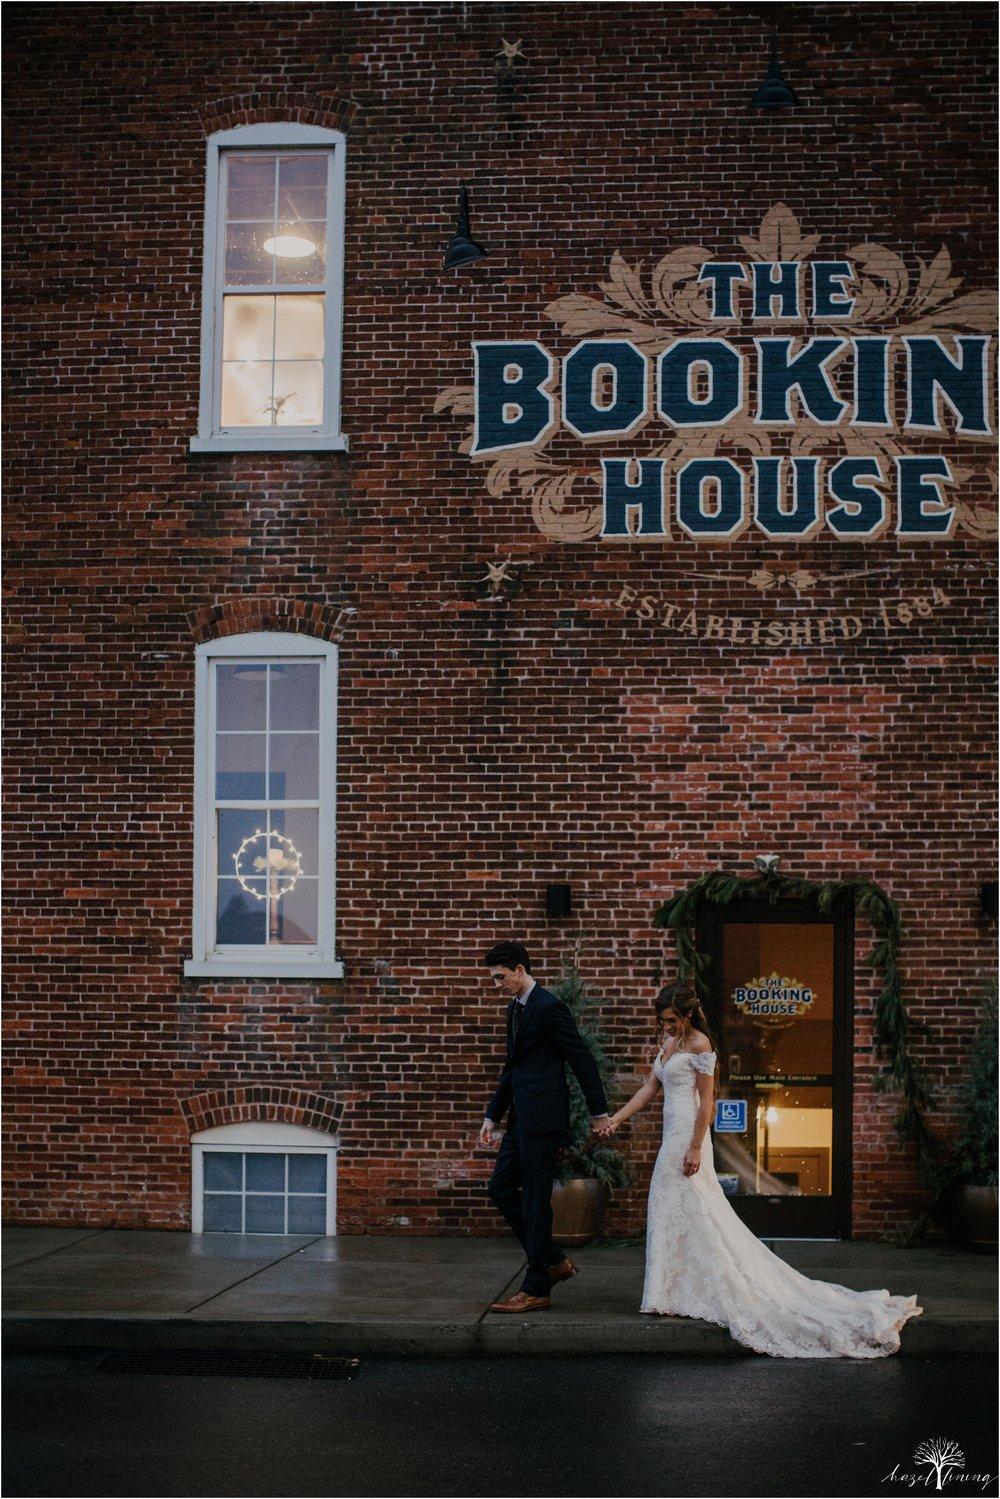 emma-matt-gehringer-the-booking-house-lancaster-manhiem-pennsylvania-winter-wedding_0194.jpg